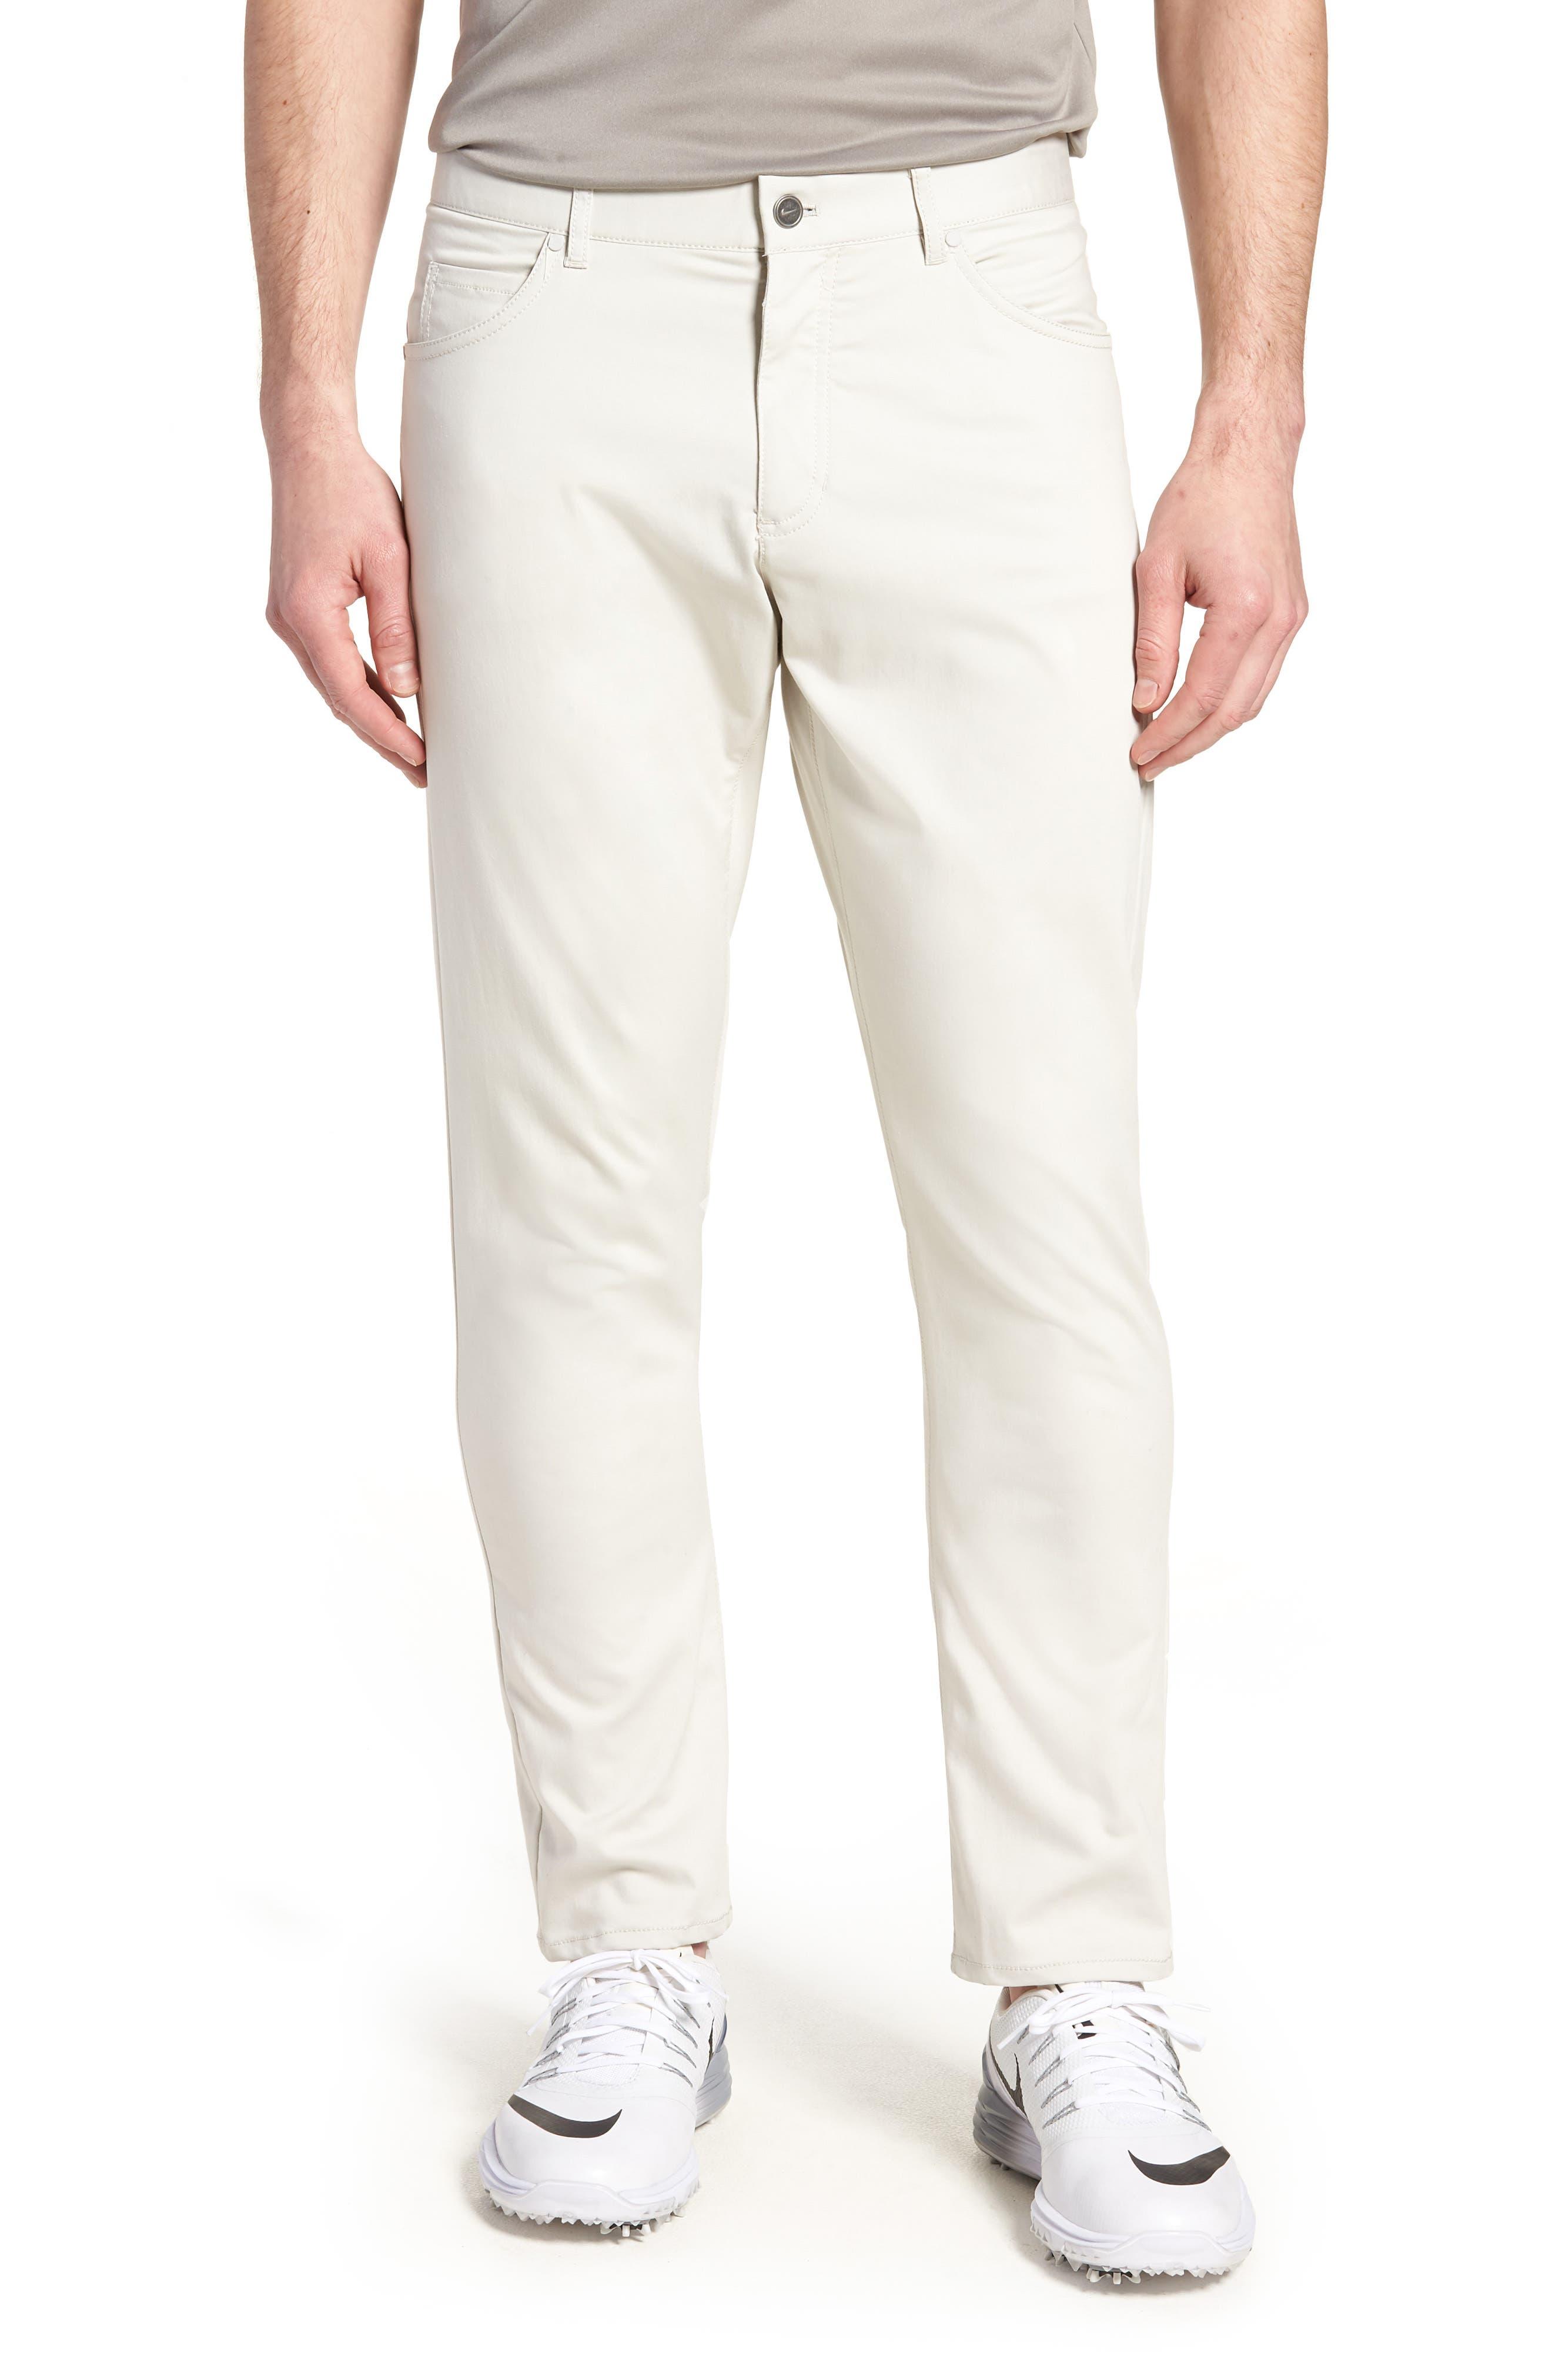 Dry Flex Slim Fit Golf Pants, Main, color, LIGHT BONE/ WHITE